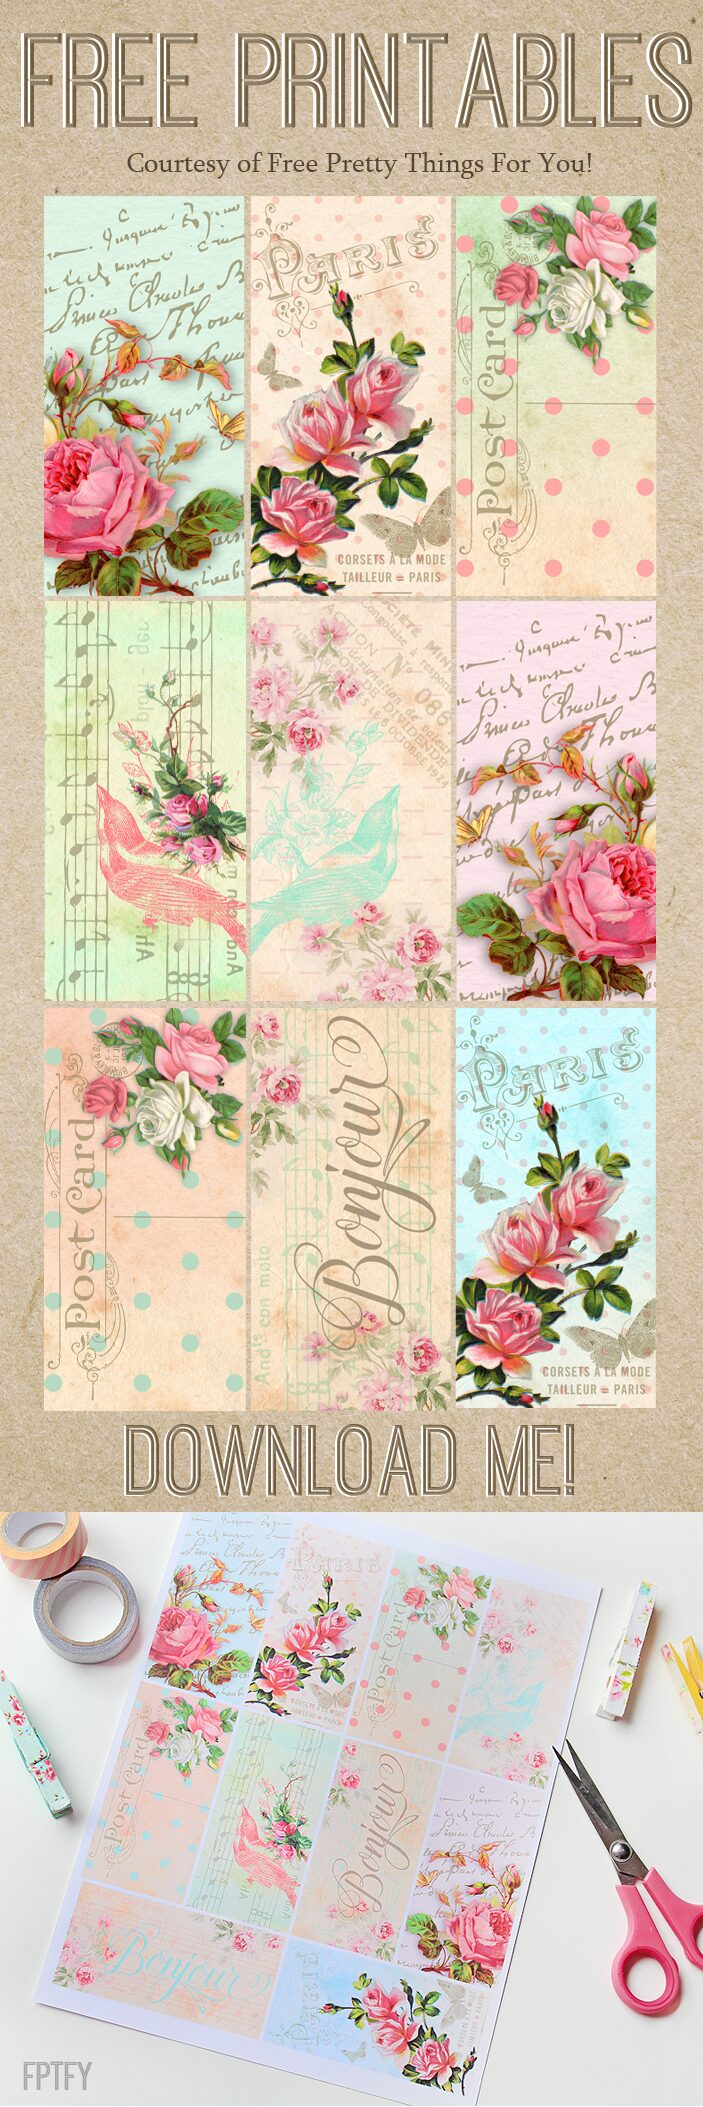 scrapbook_journaling_romantic_free_printables_FPTFY_1